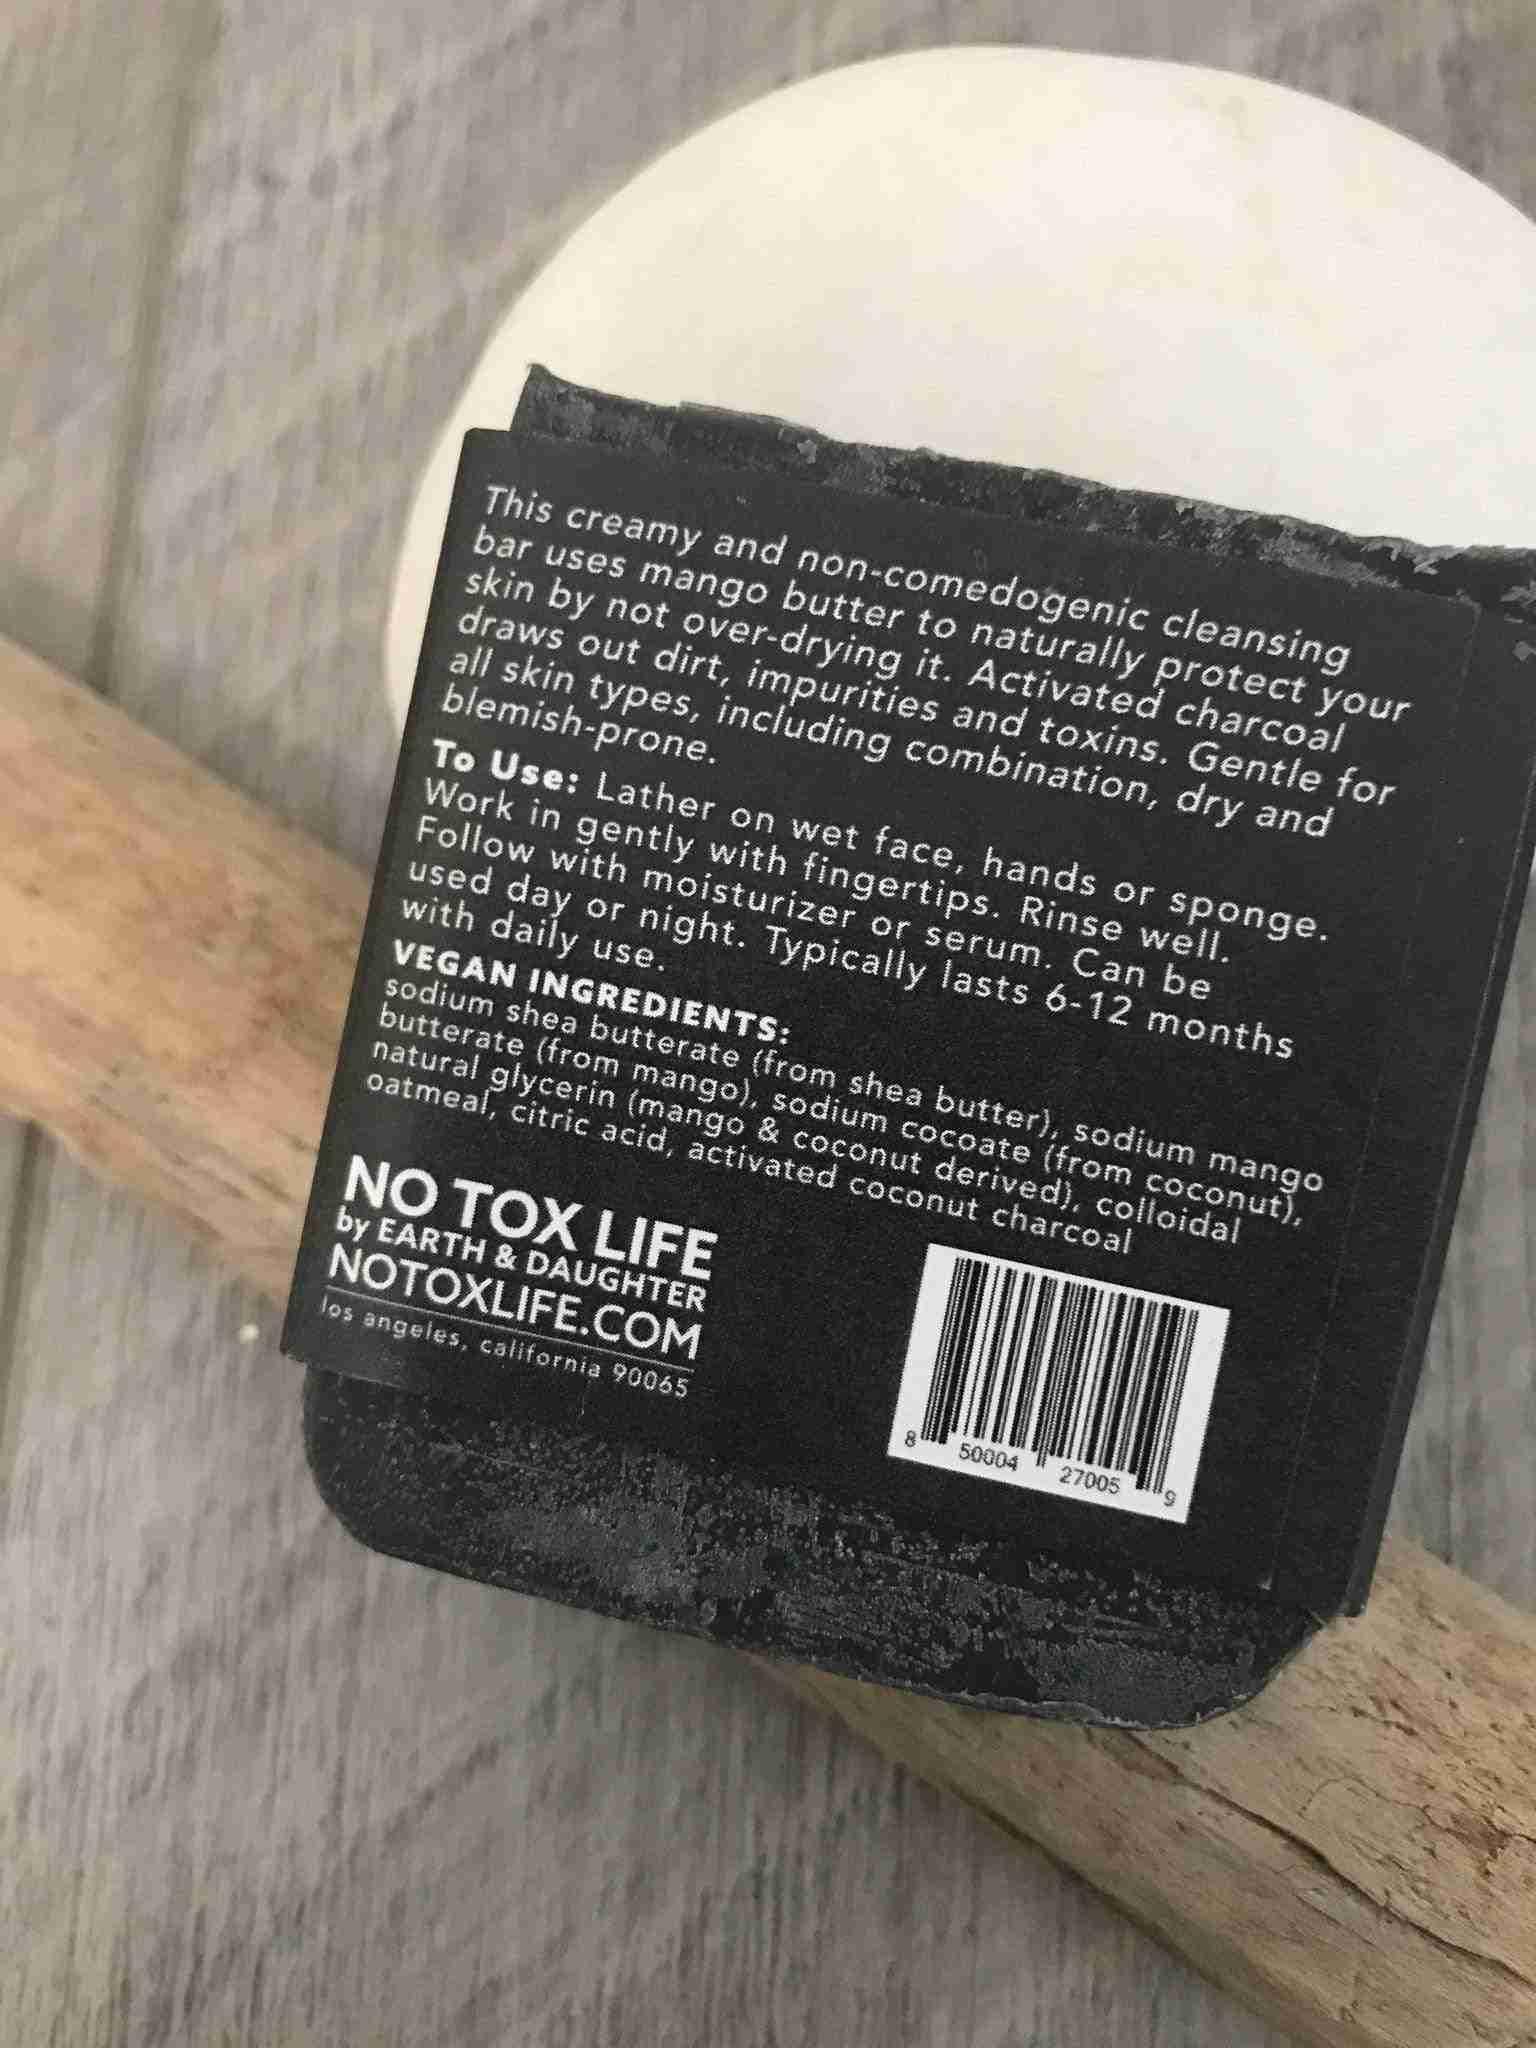 ONYX Detoxifying & Cleansing Vegan Facial Bar